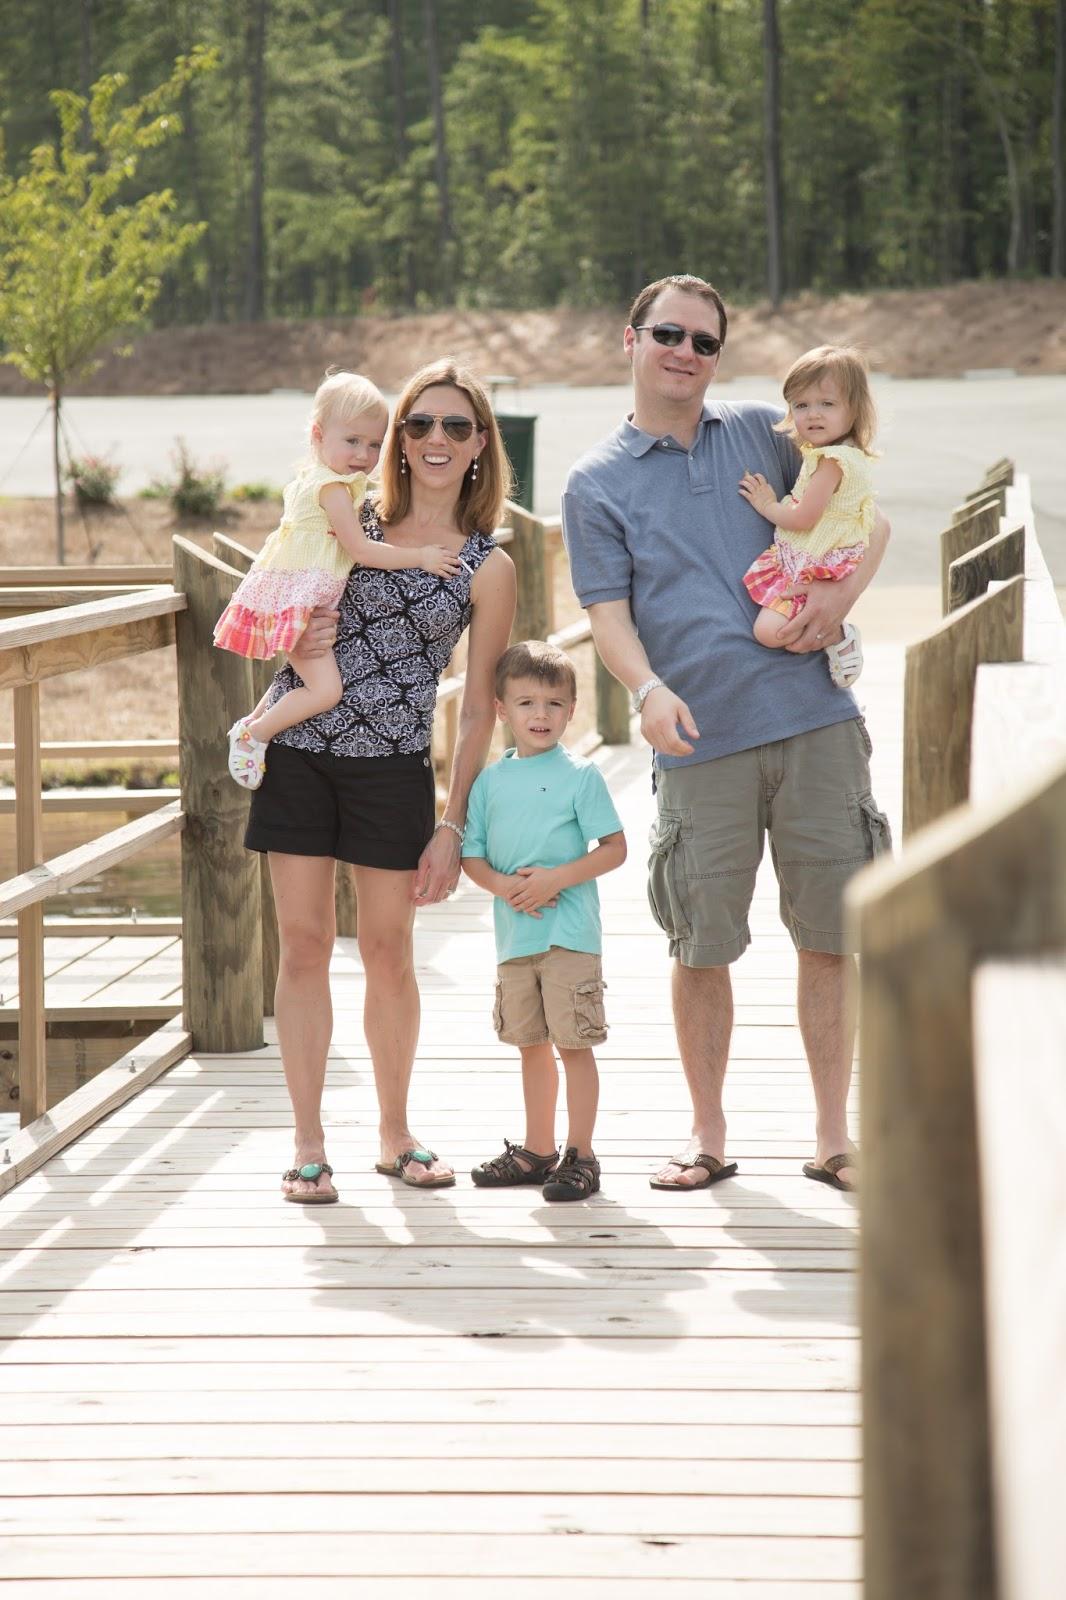 Hagge+Family+blog-48.jpg